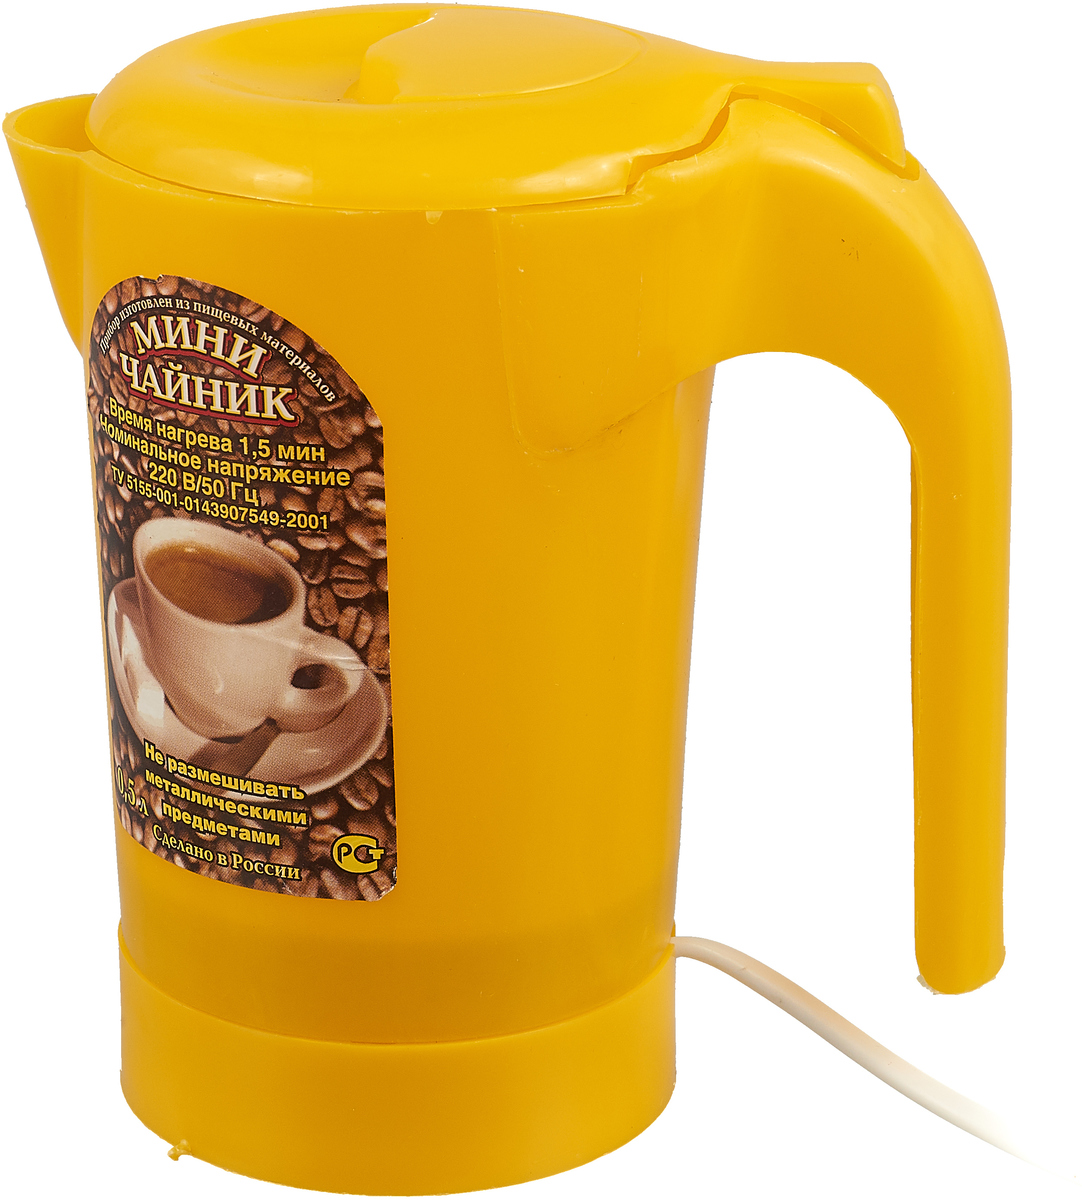 лучшая цена Электрический чайник Zimber ZM-1235, цвет: желтый